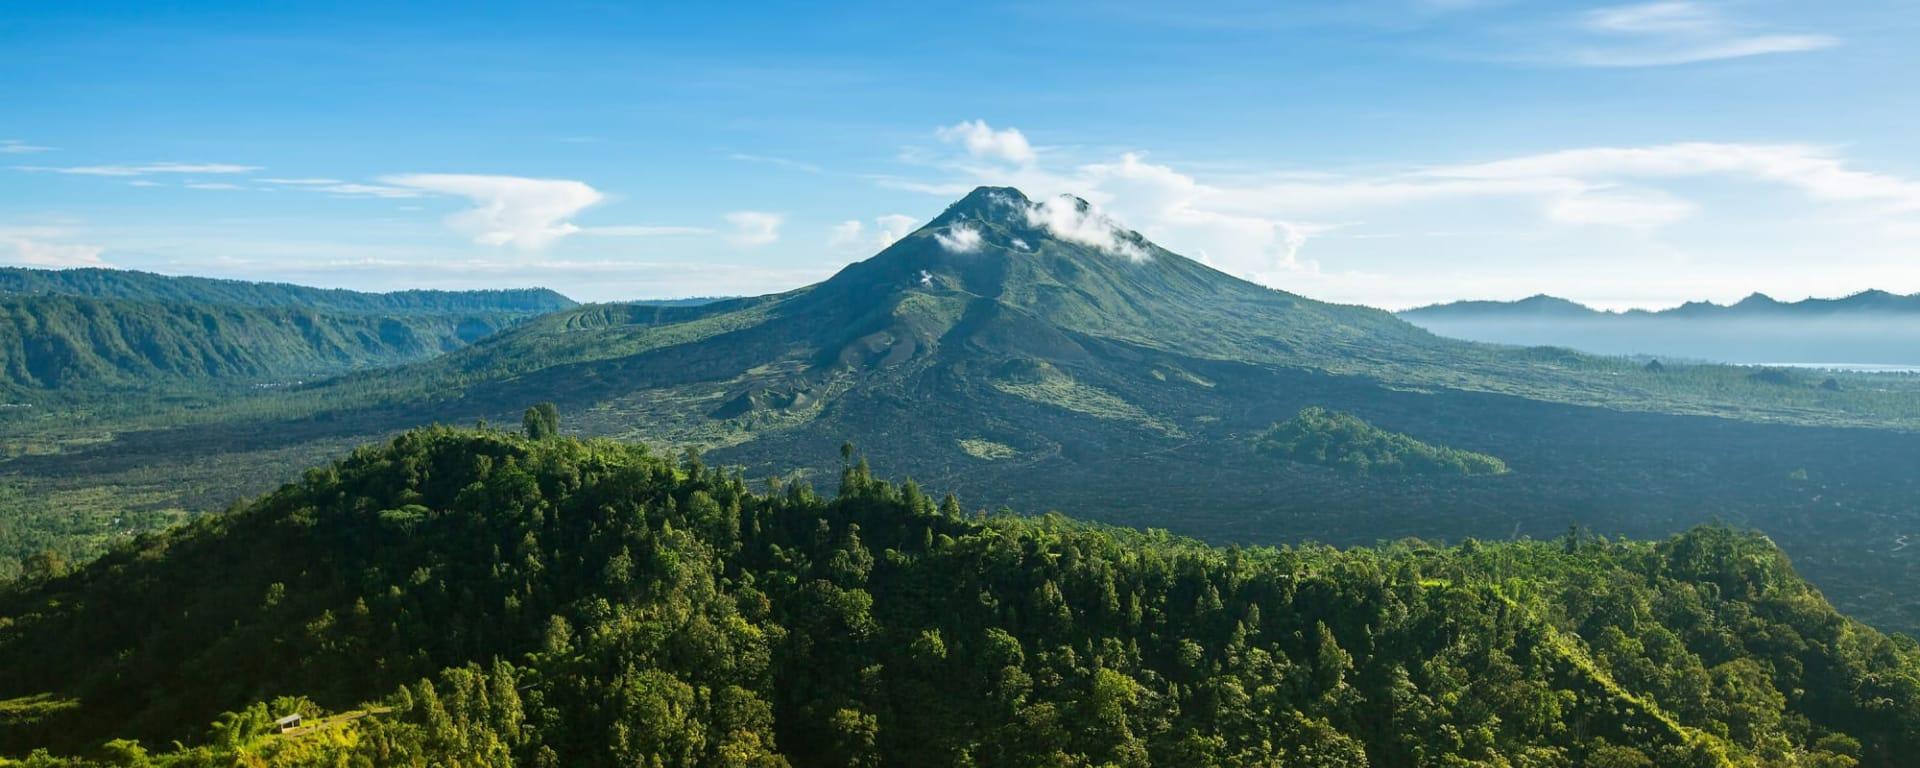 Soft Adventure Bali ab Süd-Bali: Indonesien Bali Mount Batur